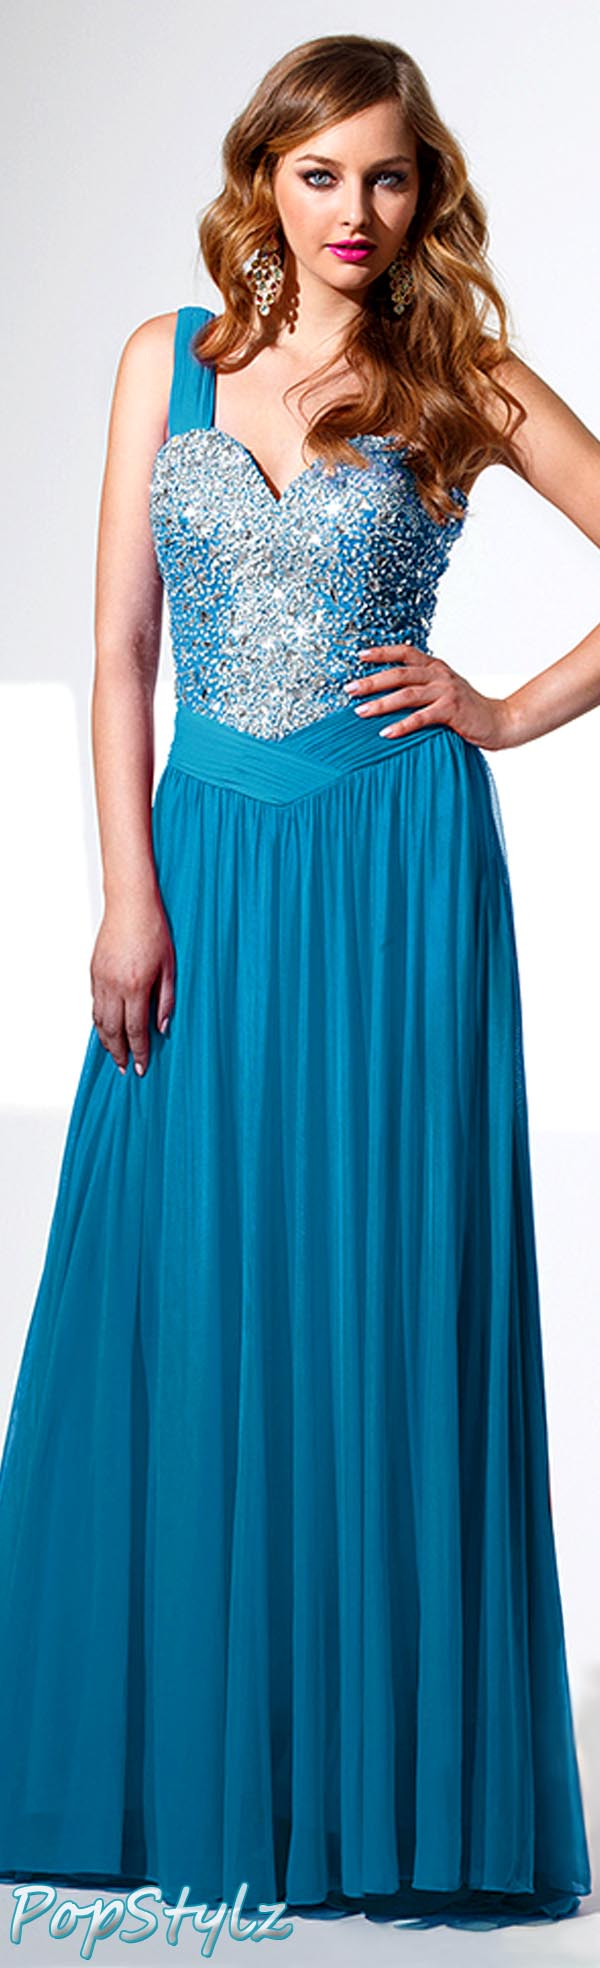 Terani P1504 Peacock Blue Gown